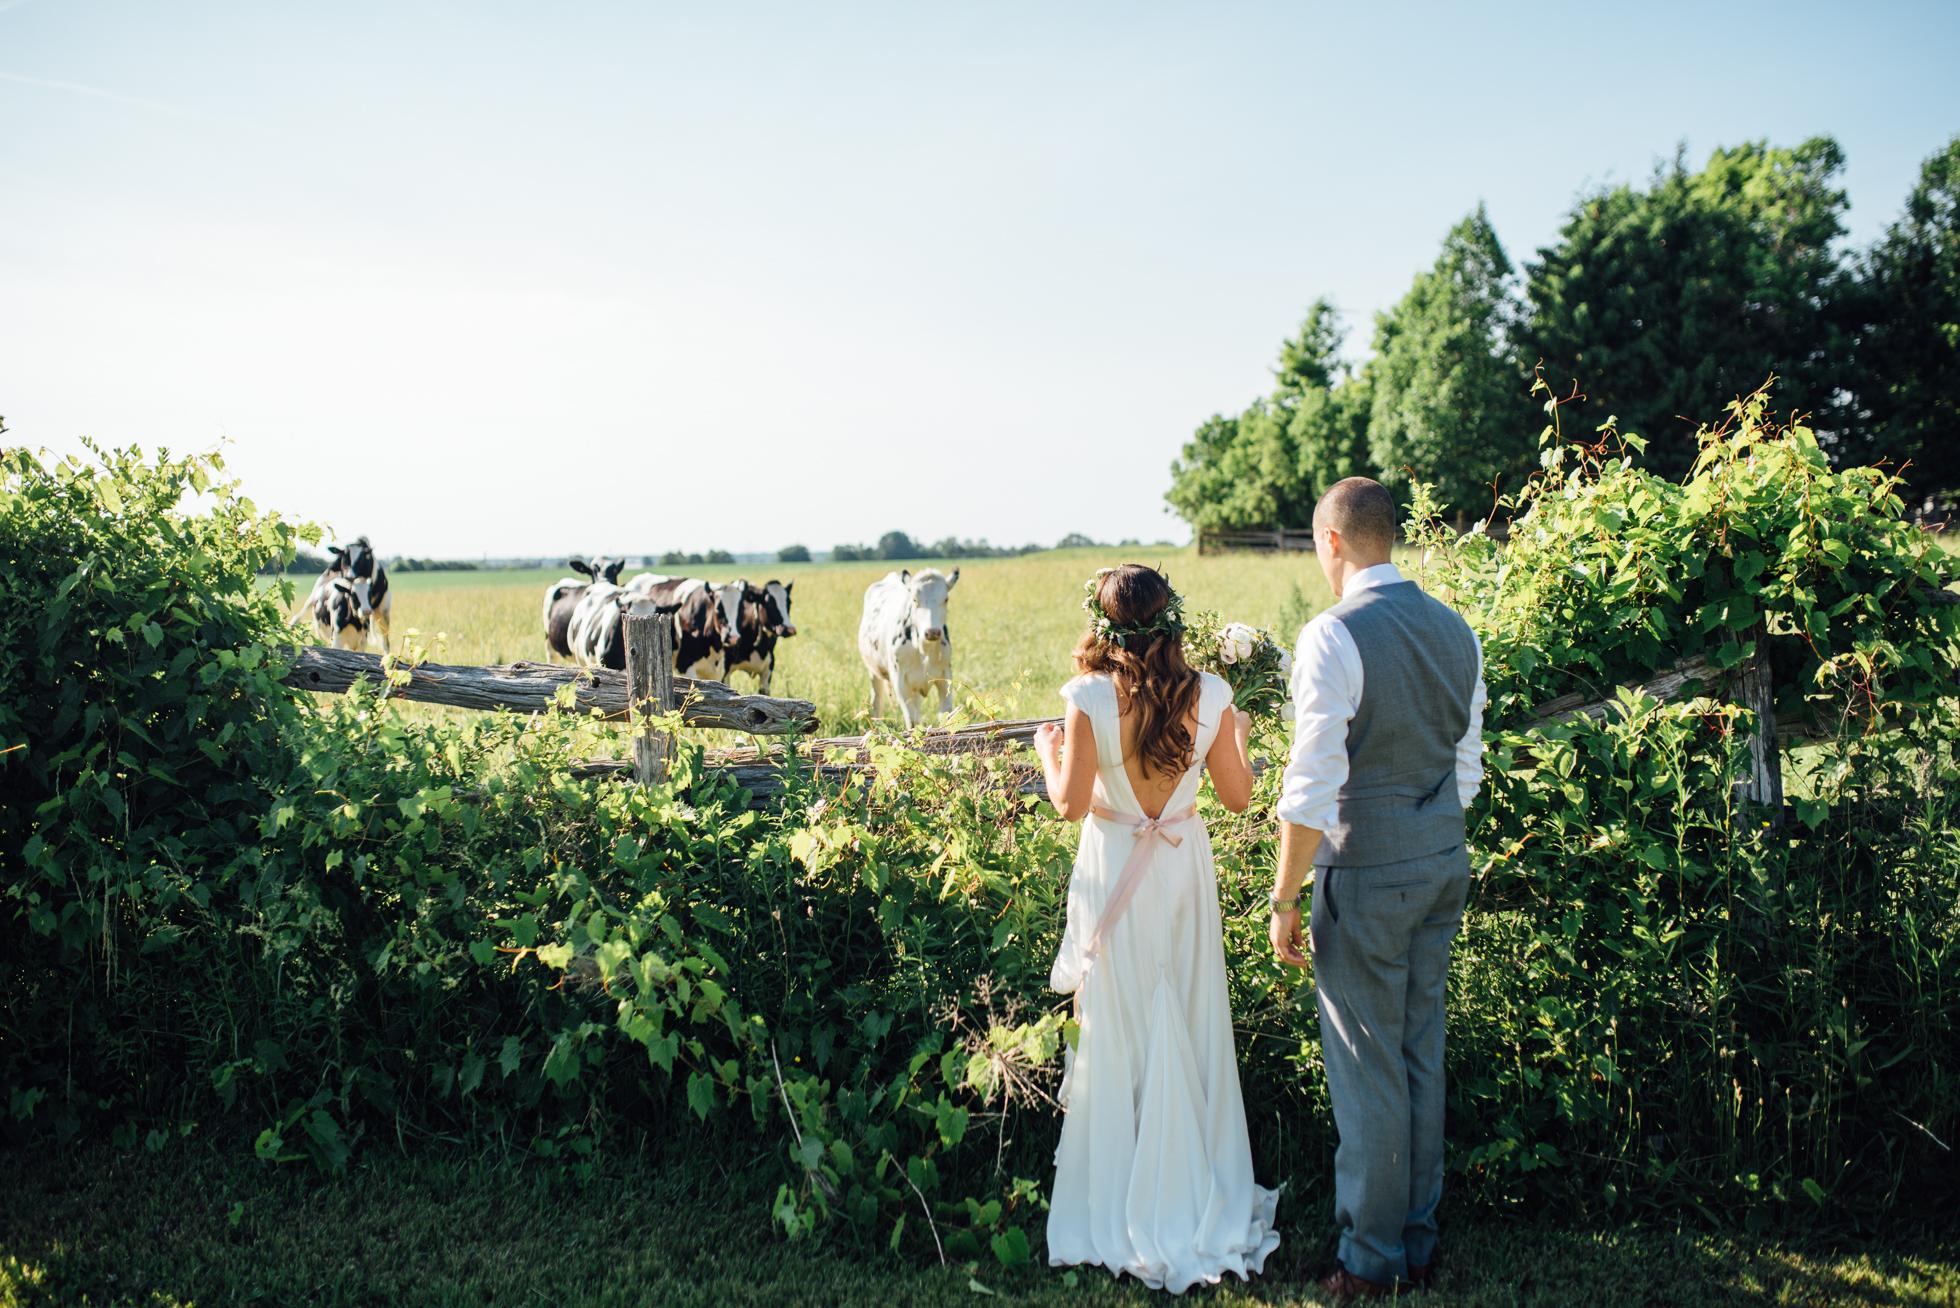 Downswell-Barn-Wedding-Photography-80.jpg